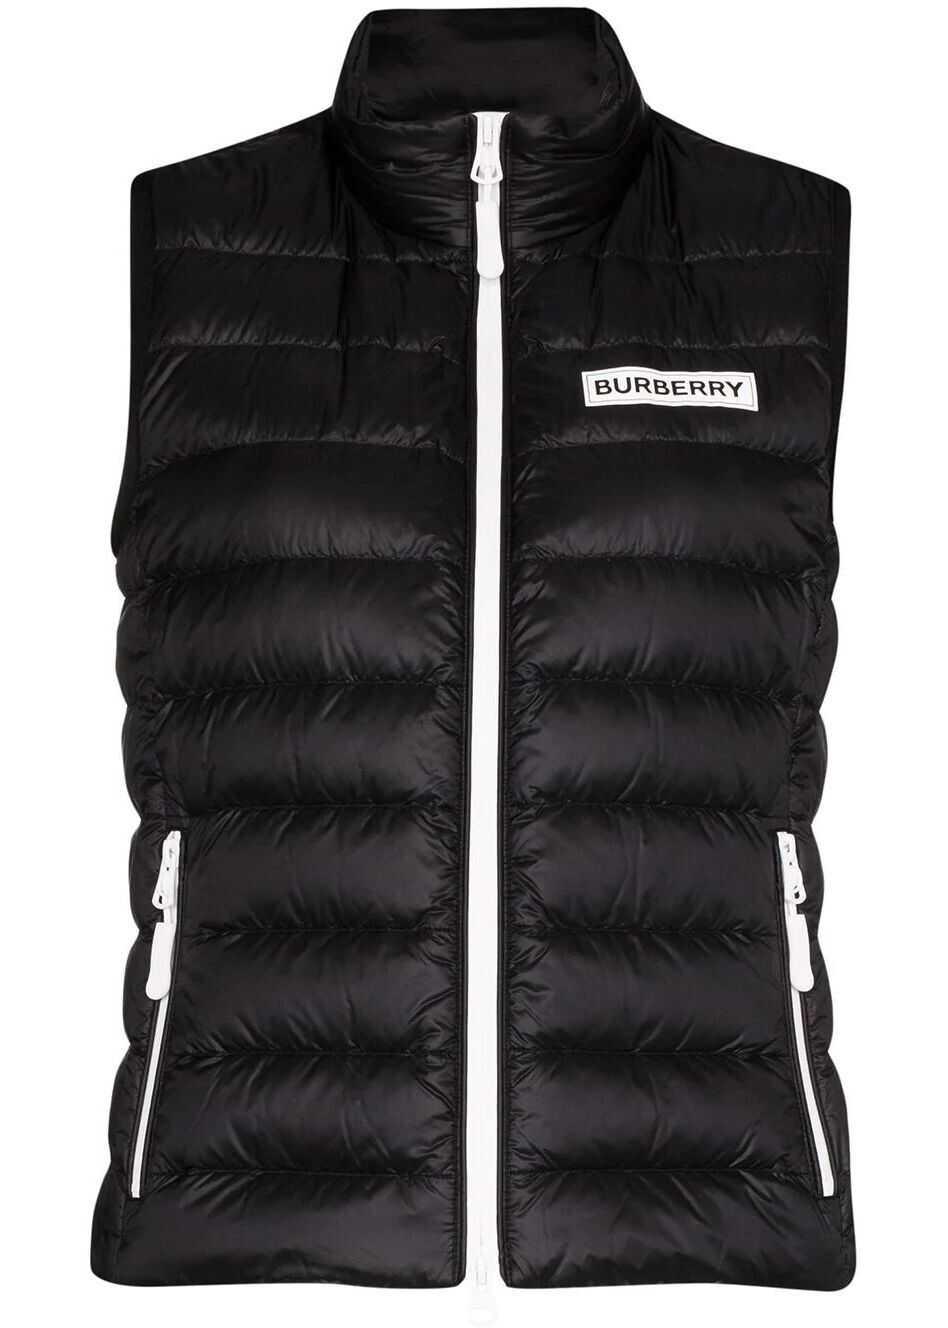 Burberry Polyester Vest BLACK